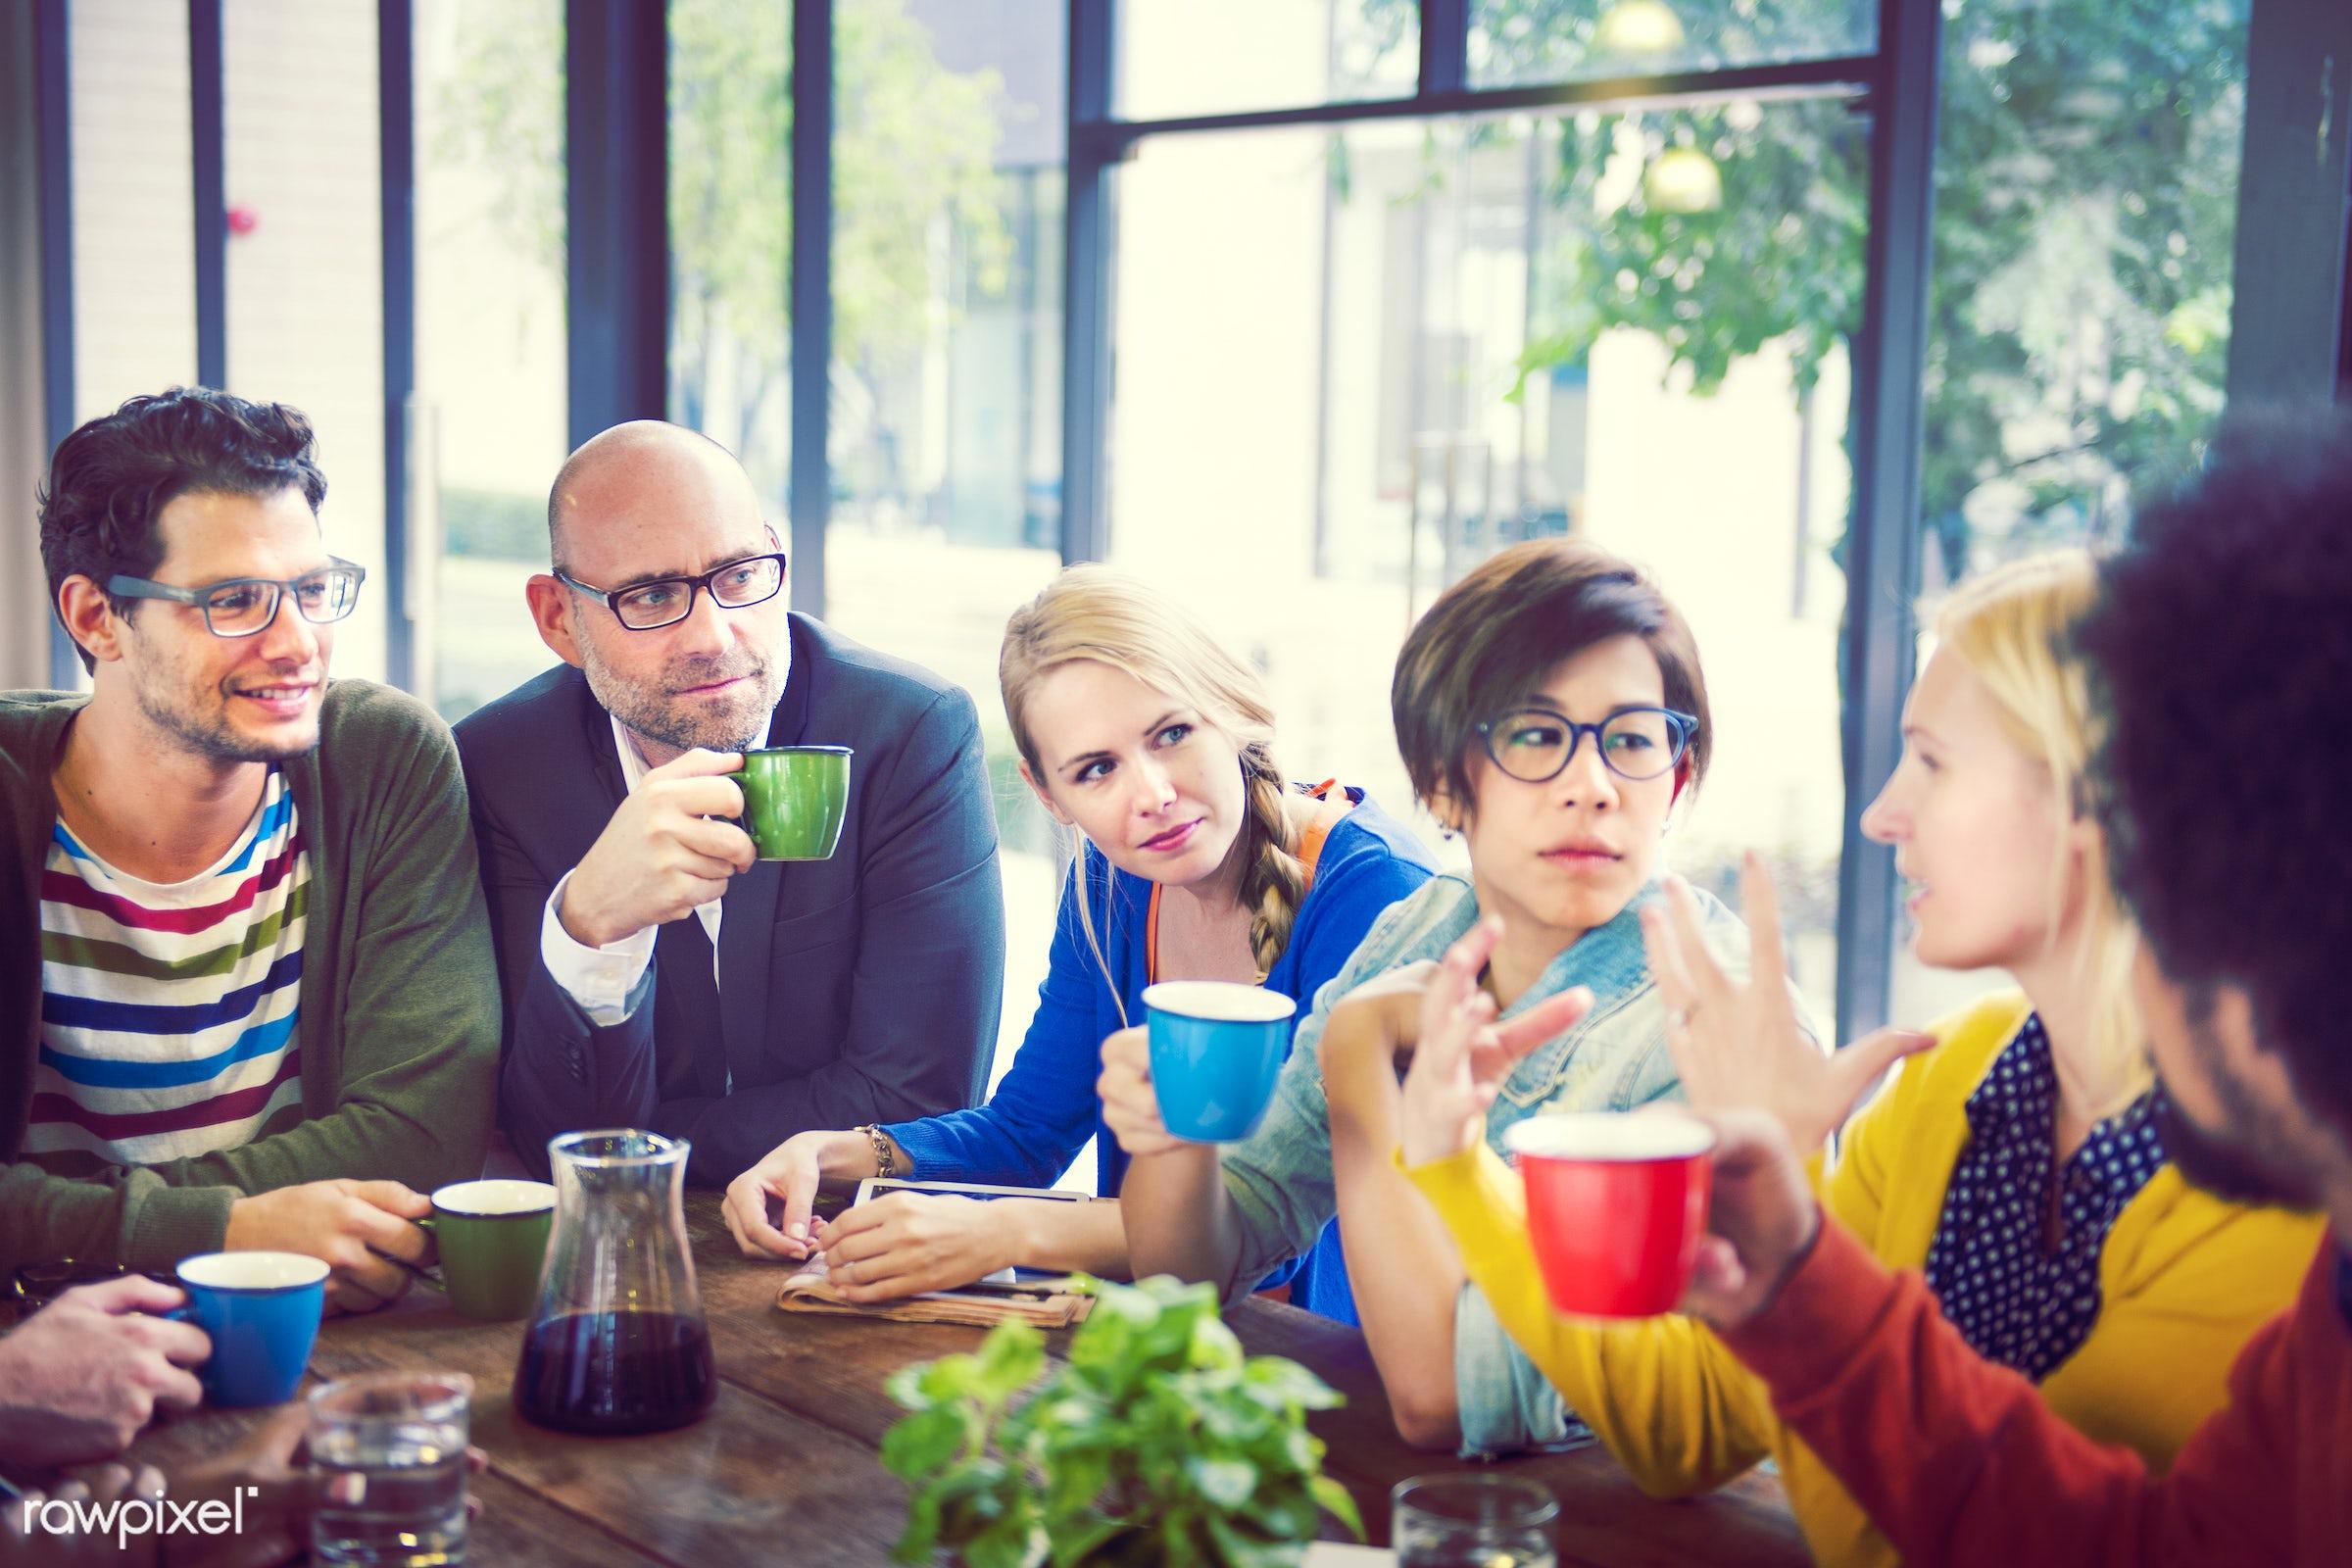 Group of People on Coffee Break - beverage, bonding, cafe, caucasian, cheerful, coffee, community, drink, friends,...